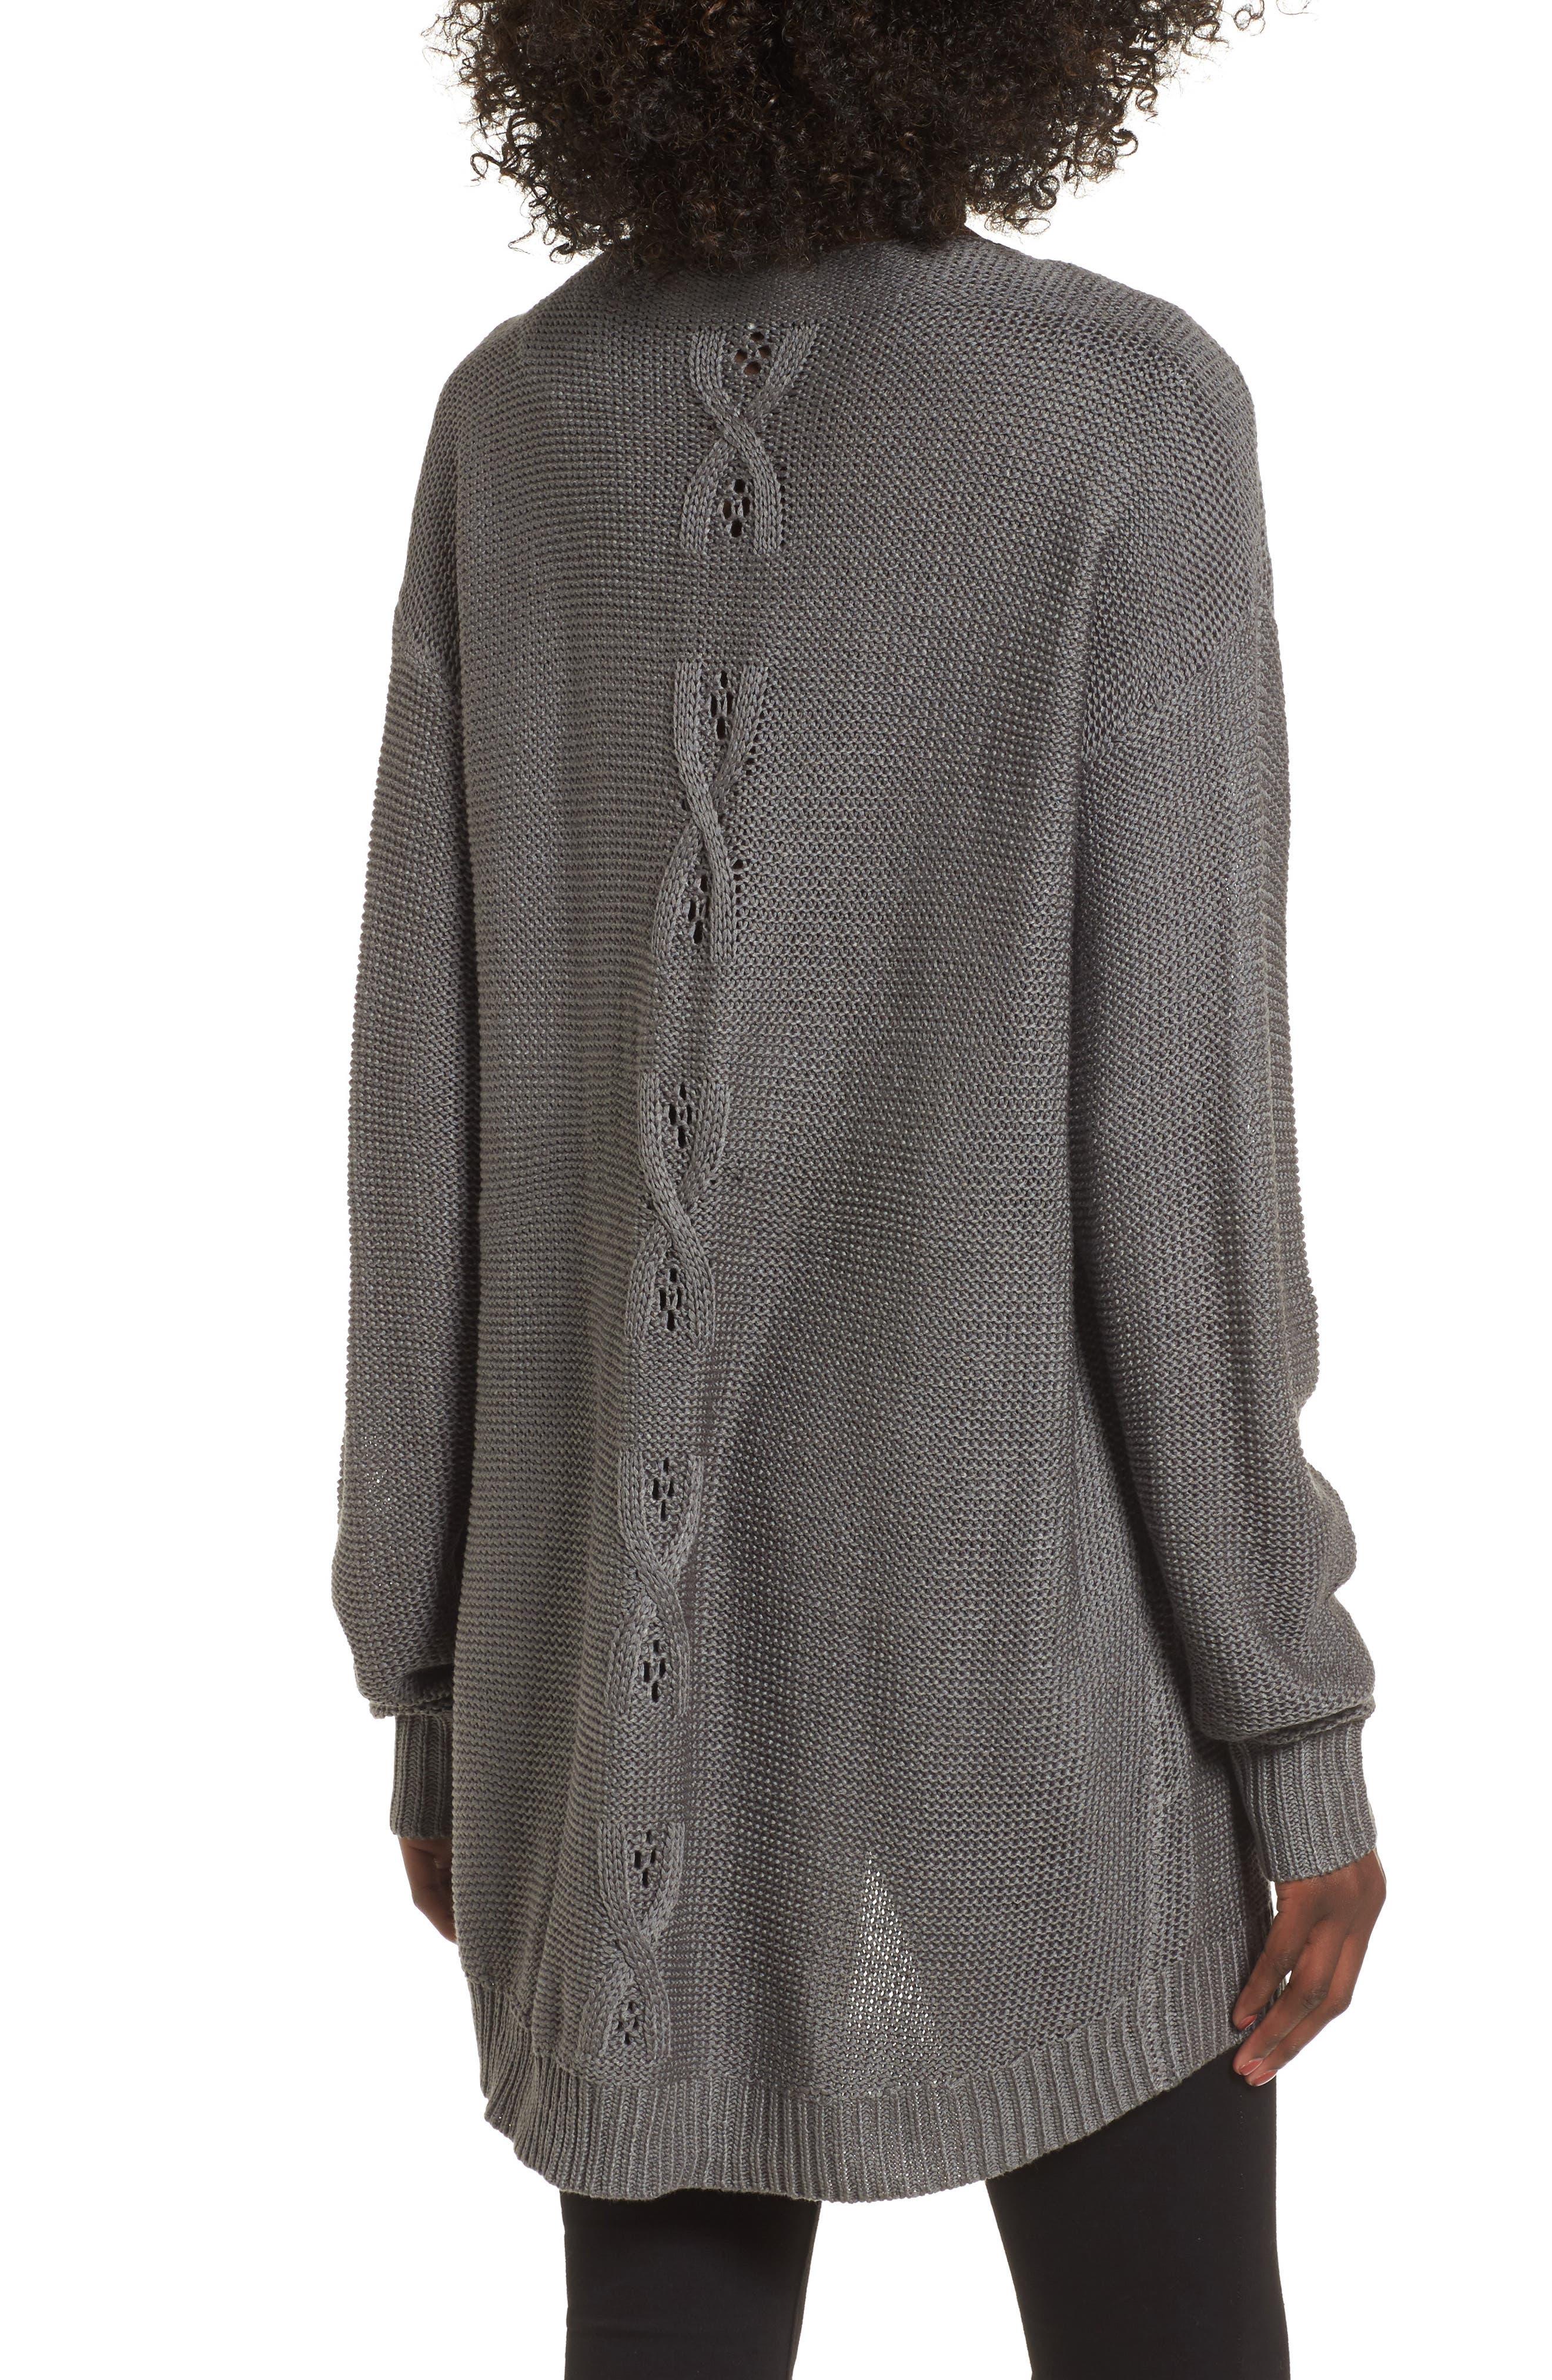 Patti Longline Sweater,                             Alternate thumbnail 2, color,                             021